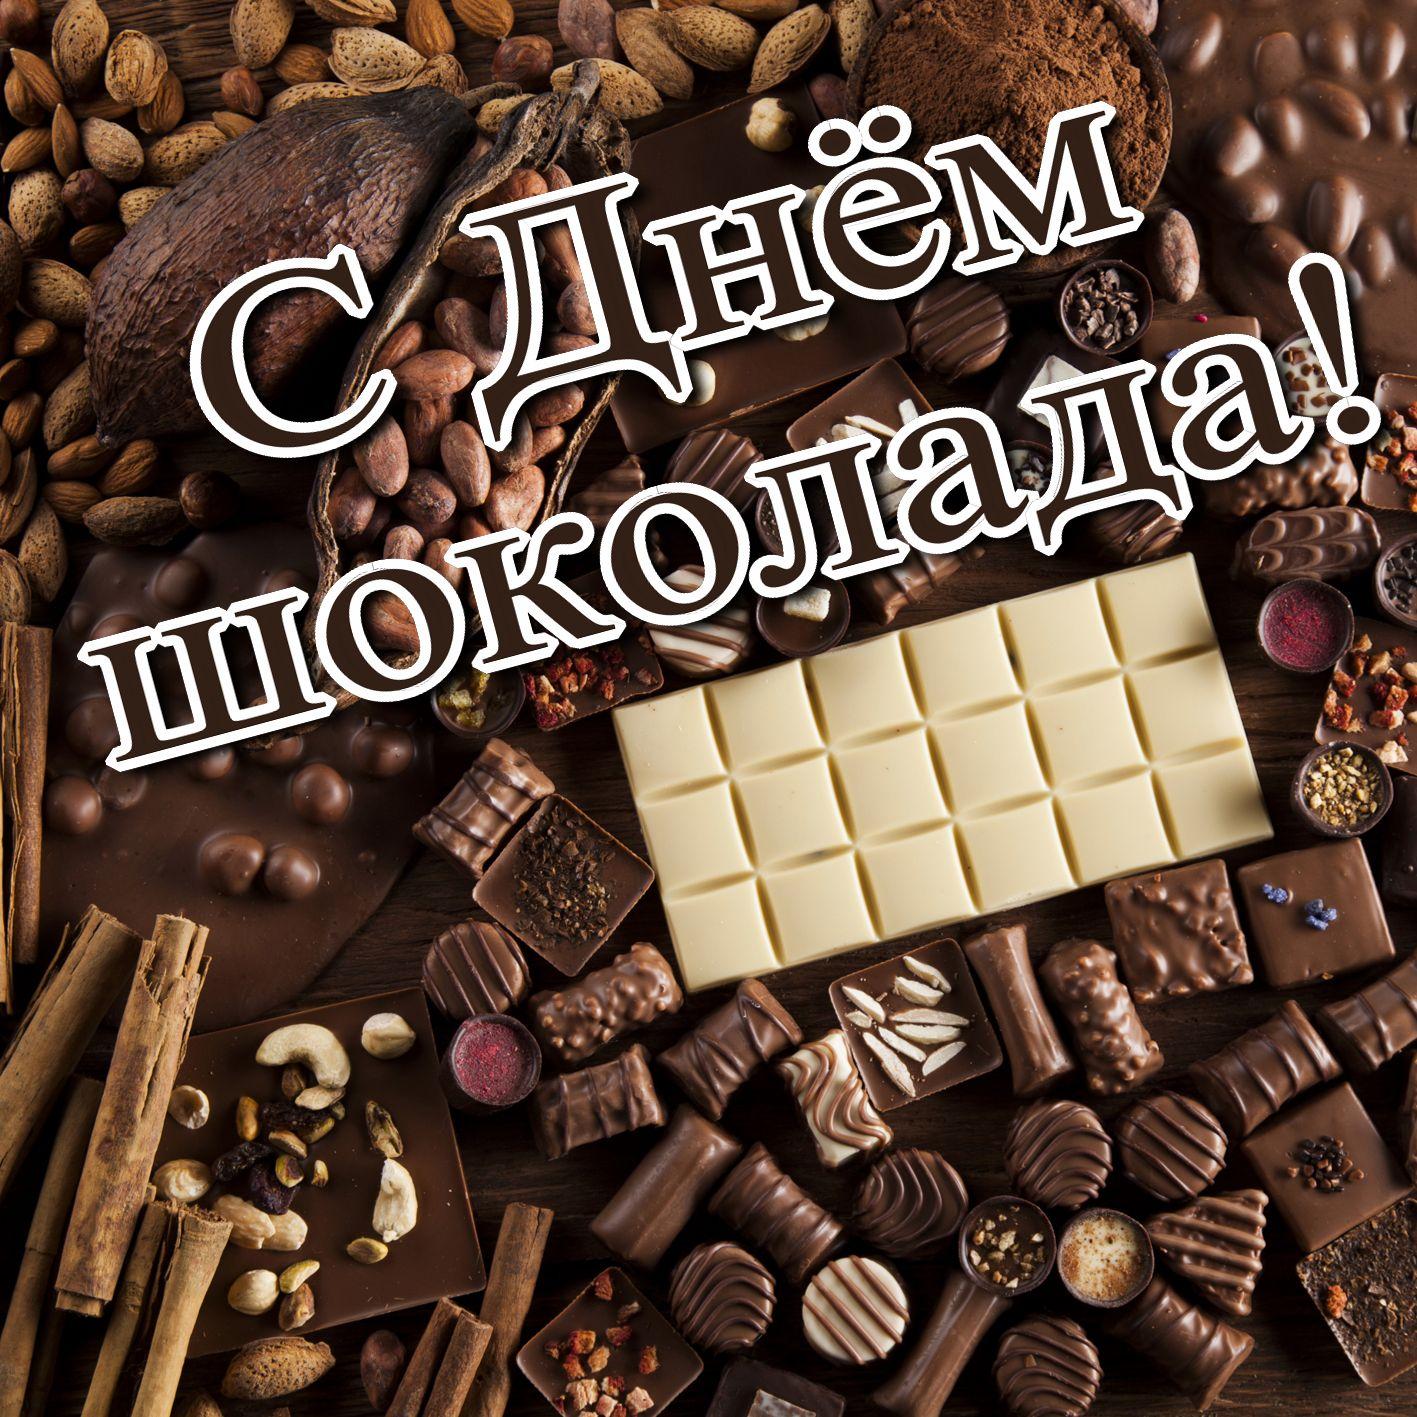 Картинка день шоколада, открытки